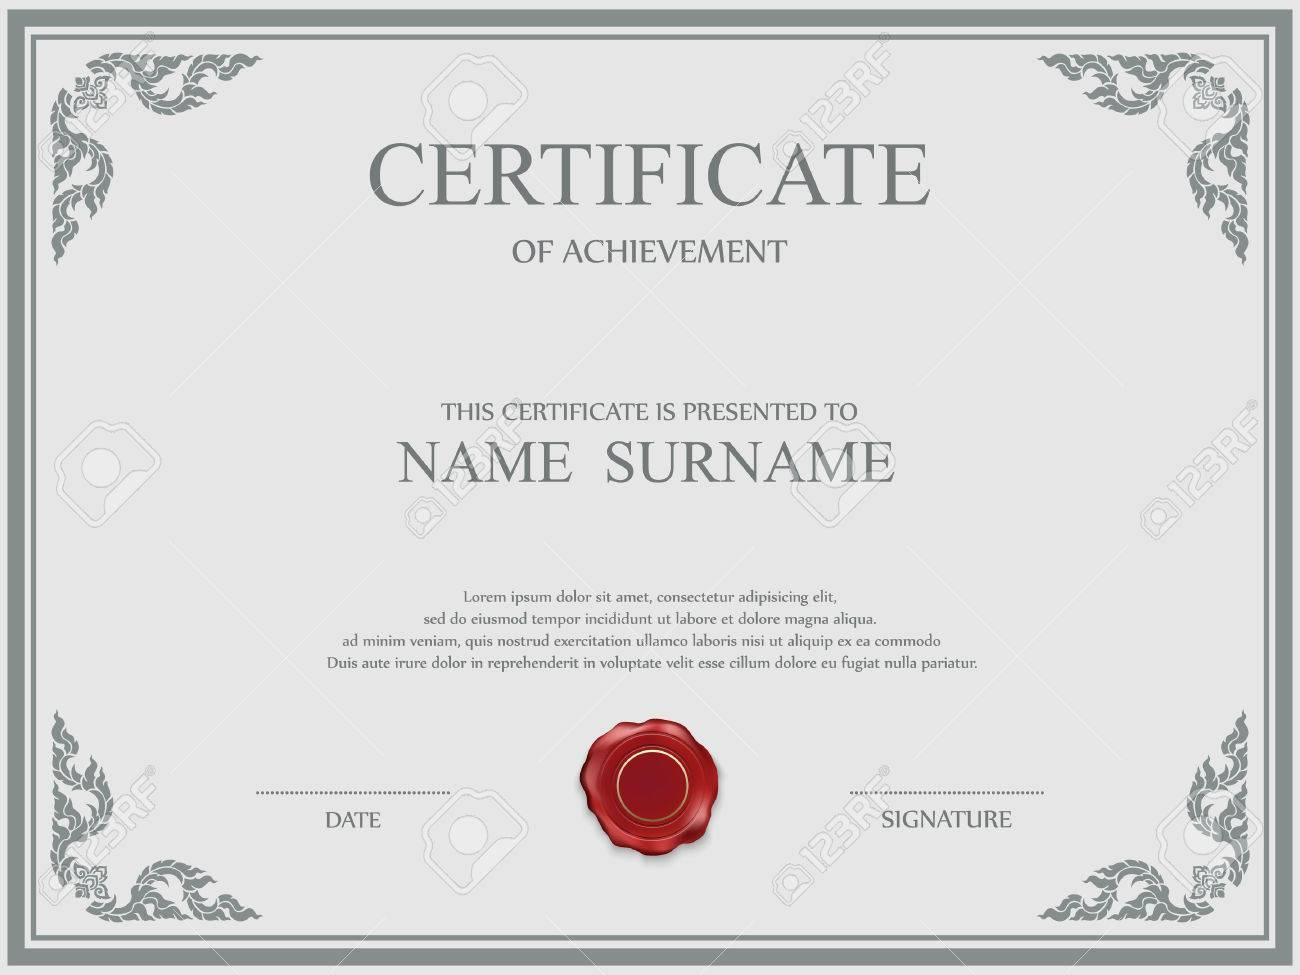 Funky Beispiel Congratulations Zertifikate Component - FORTSETZUNG ...